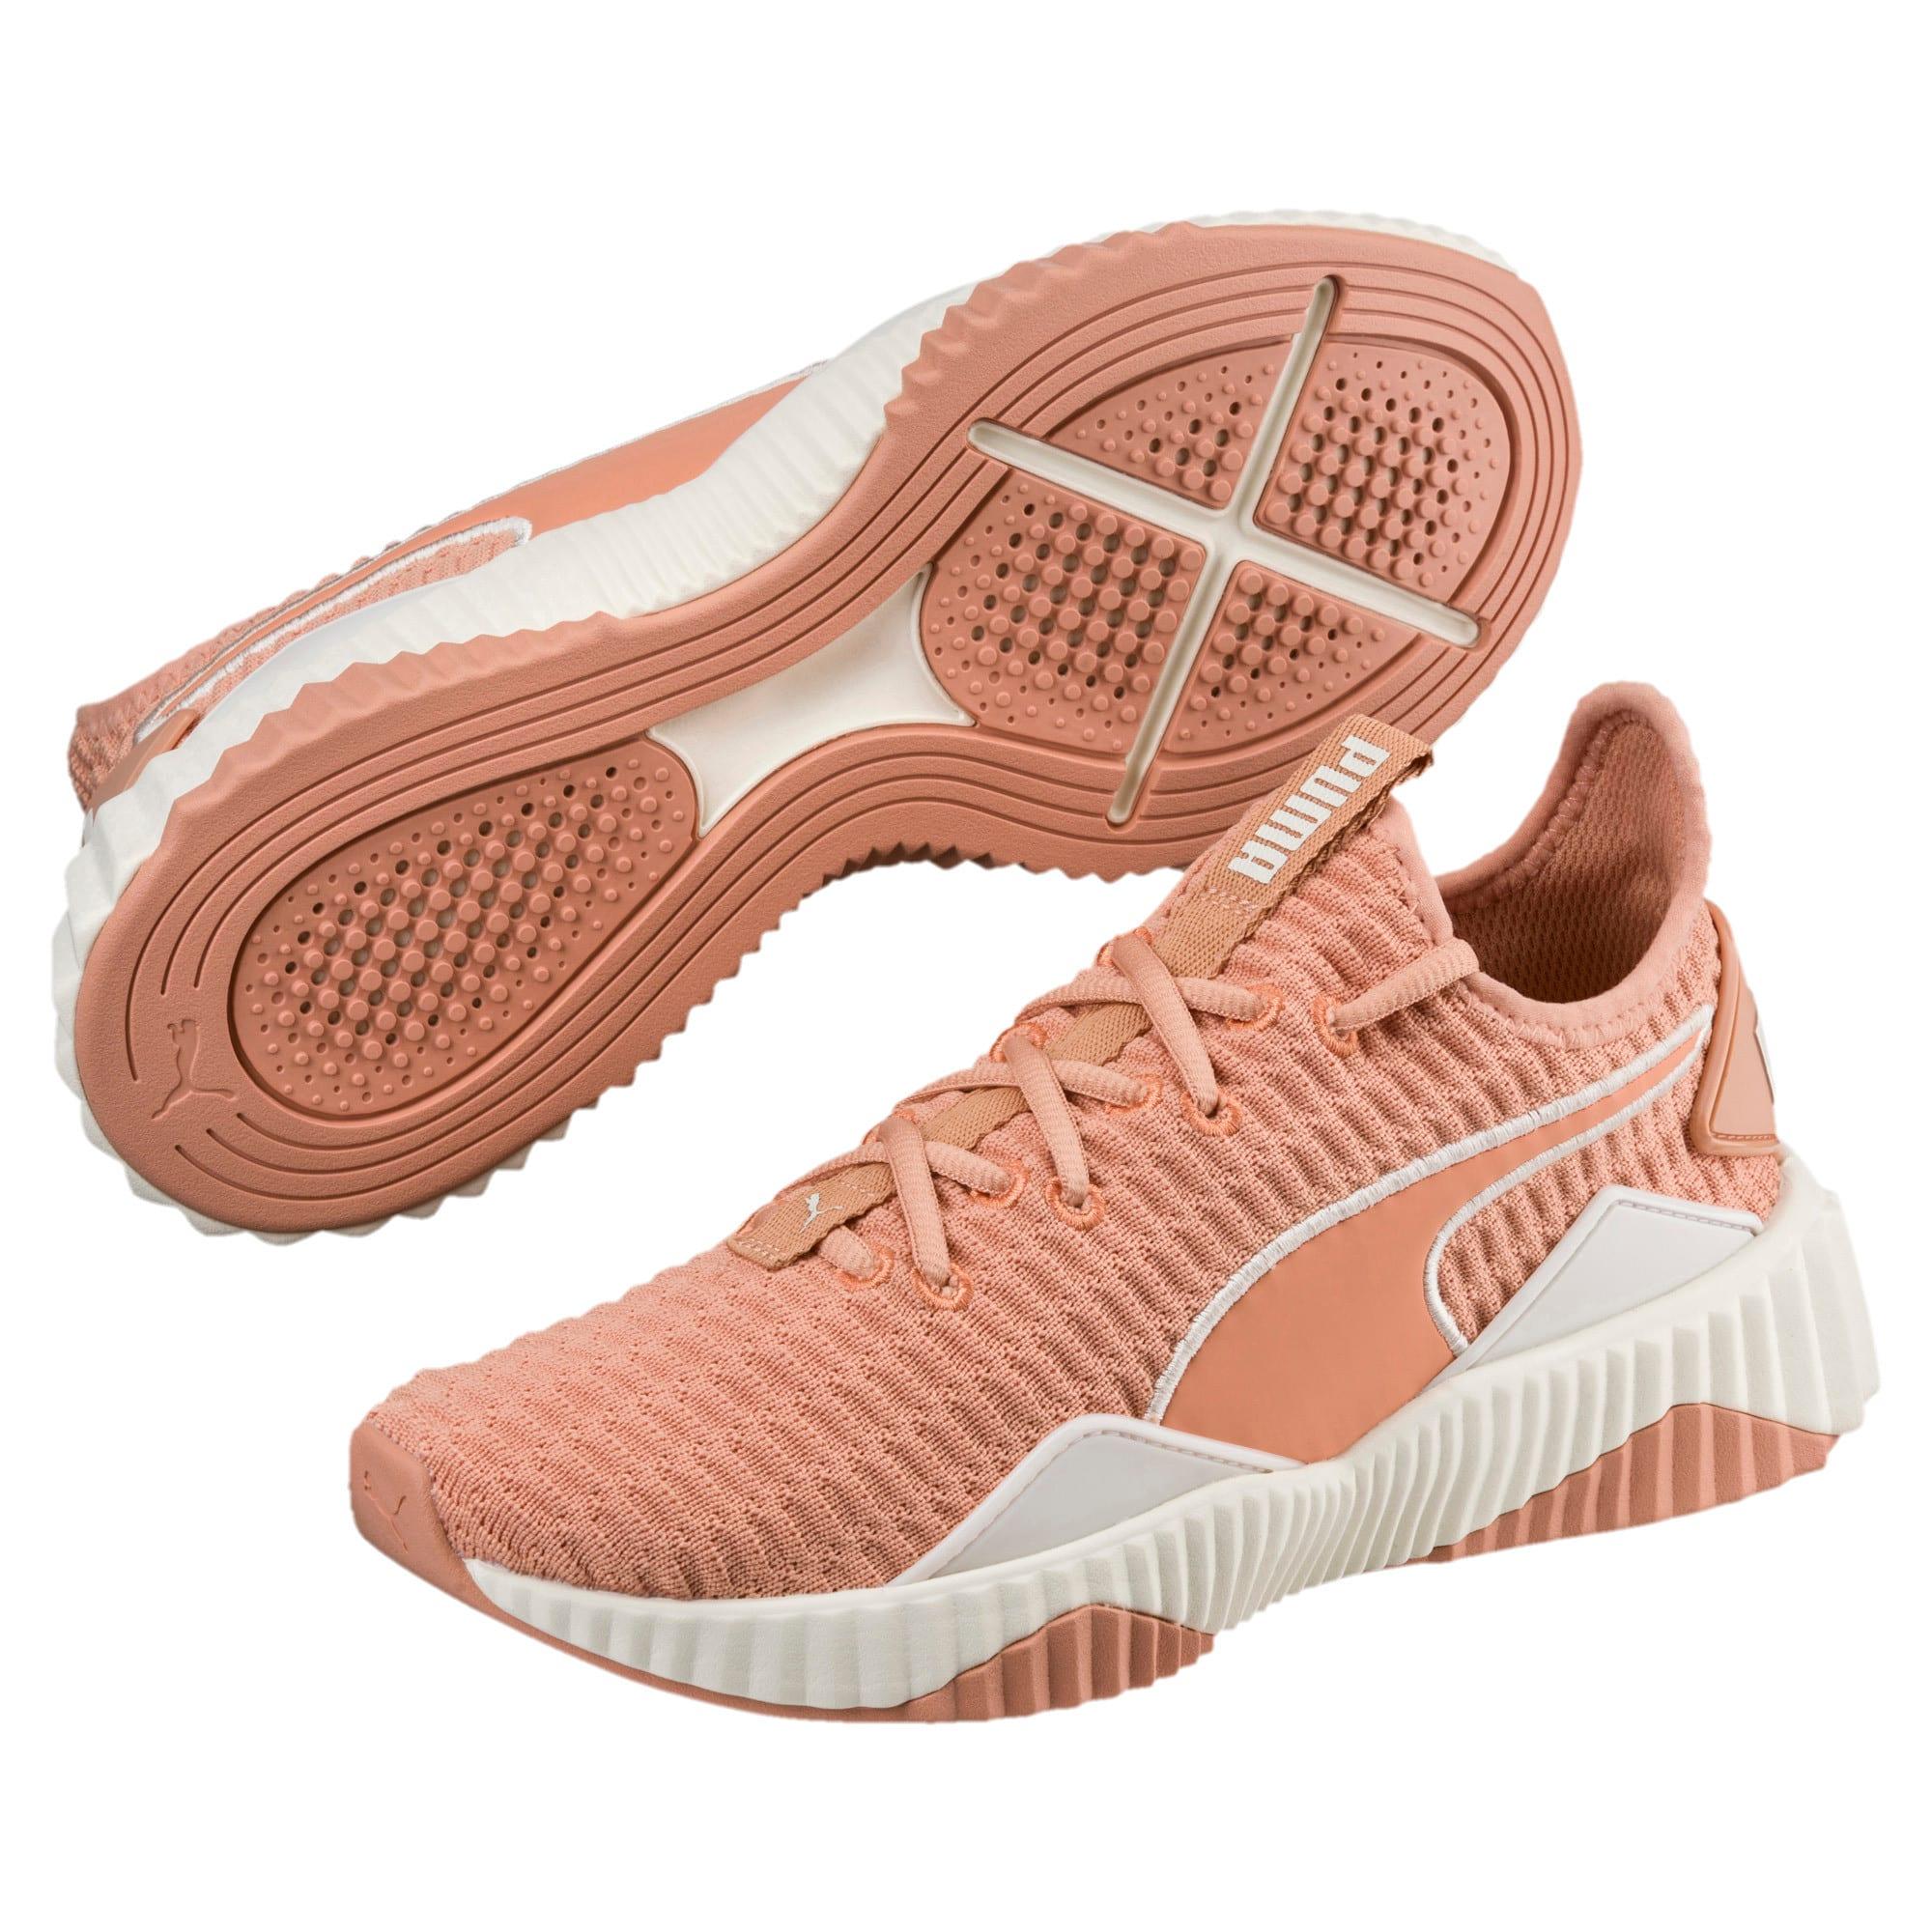 Thumbnail 2 of Defy Women's Training Shoes, Dusty Coral-Whisper White, medium